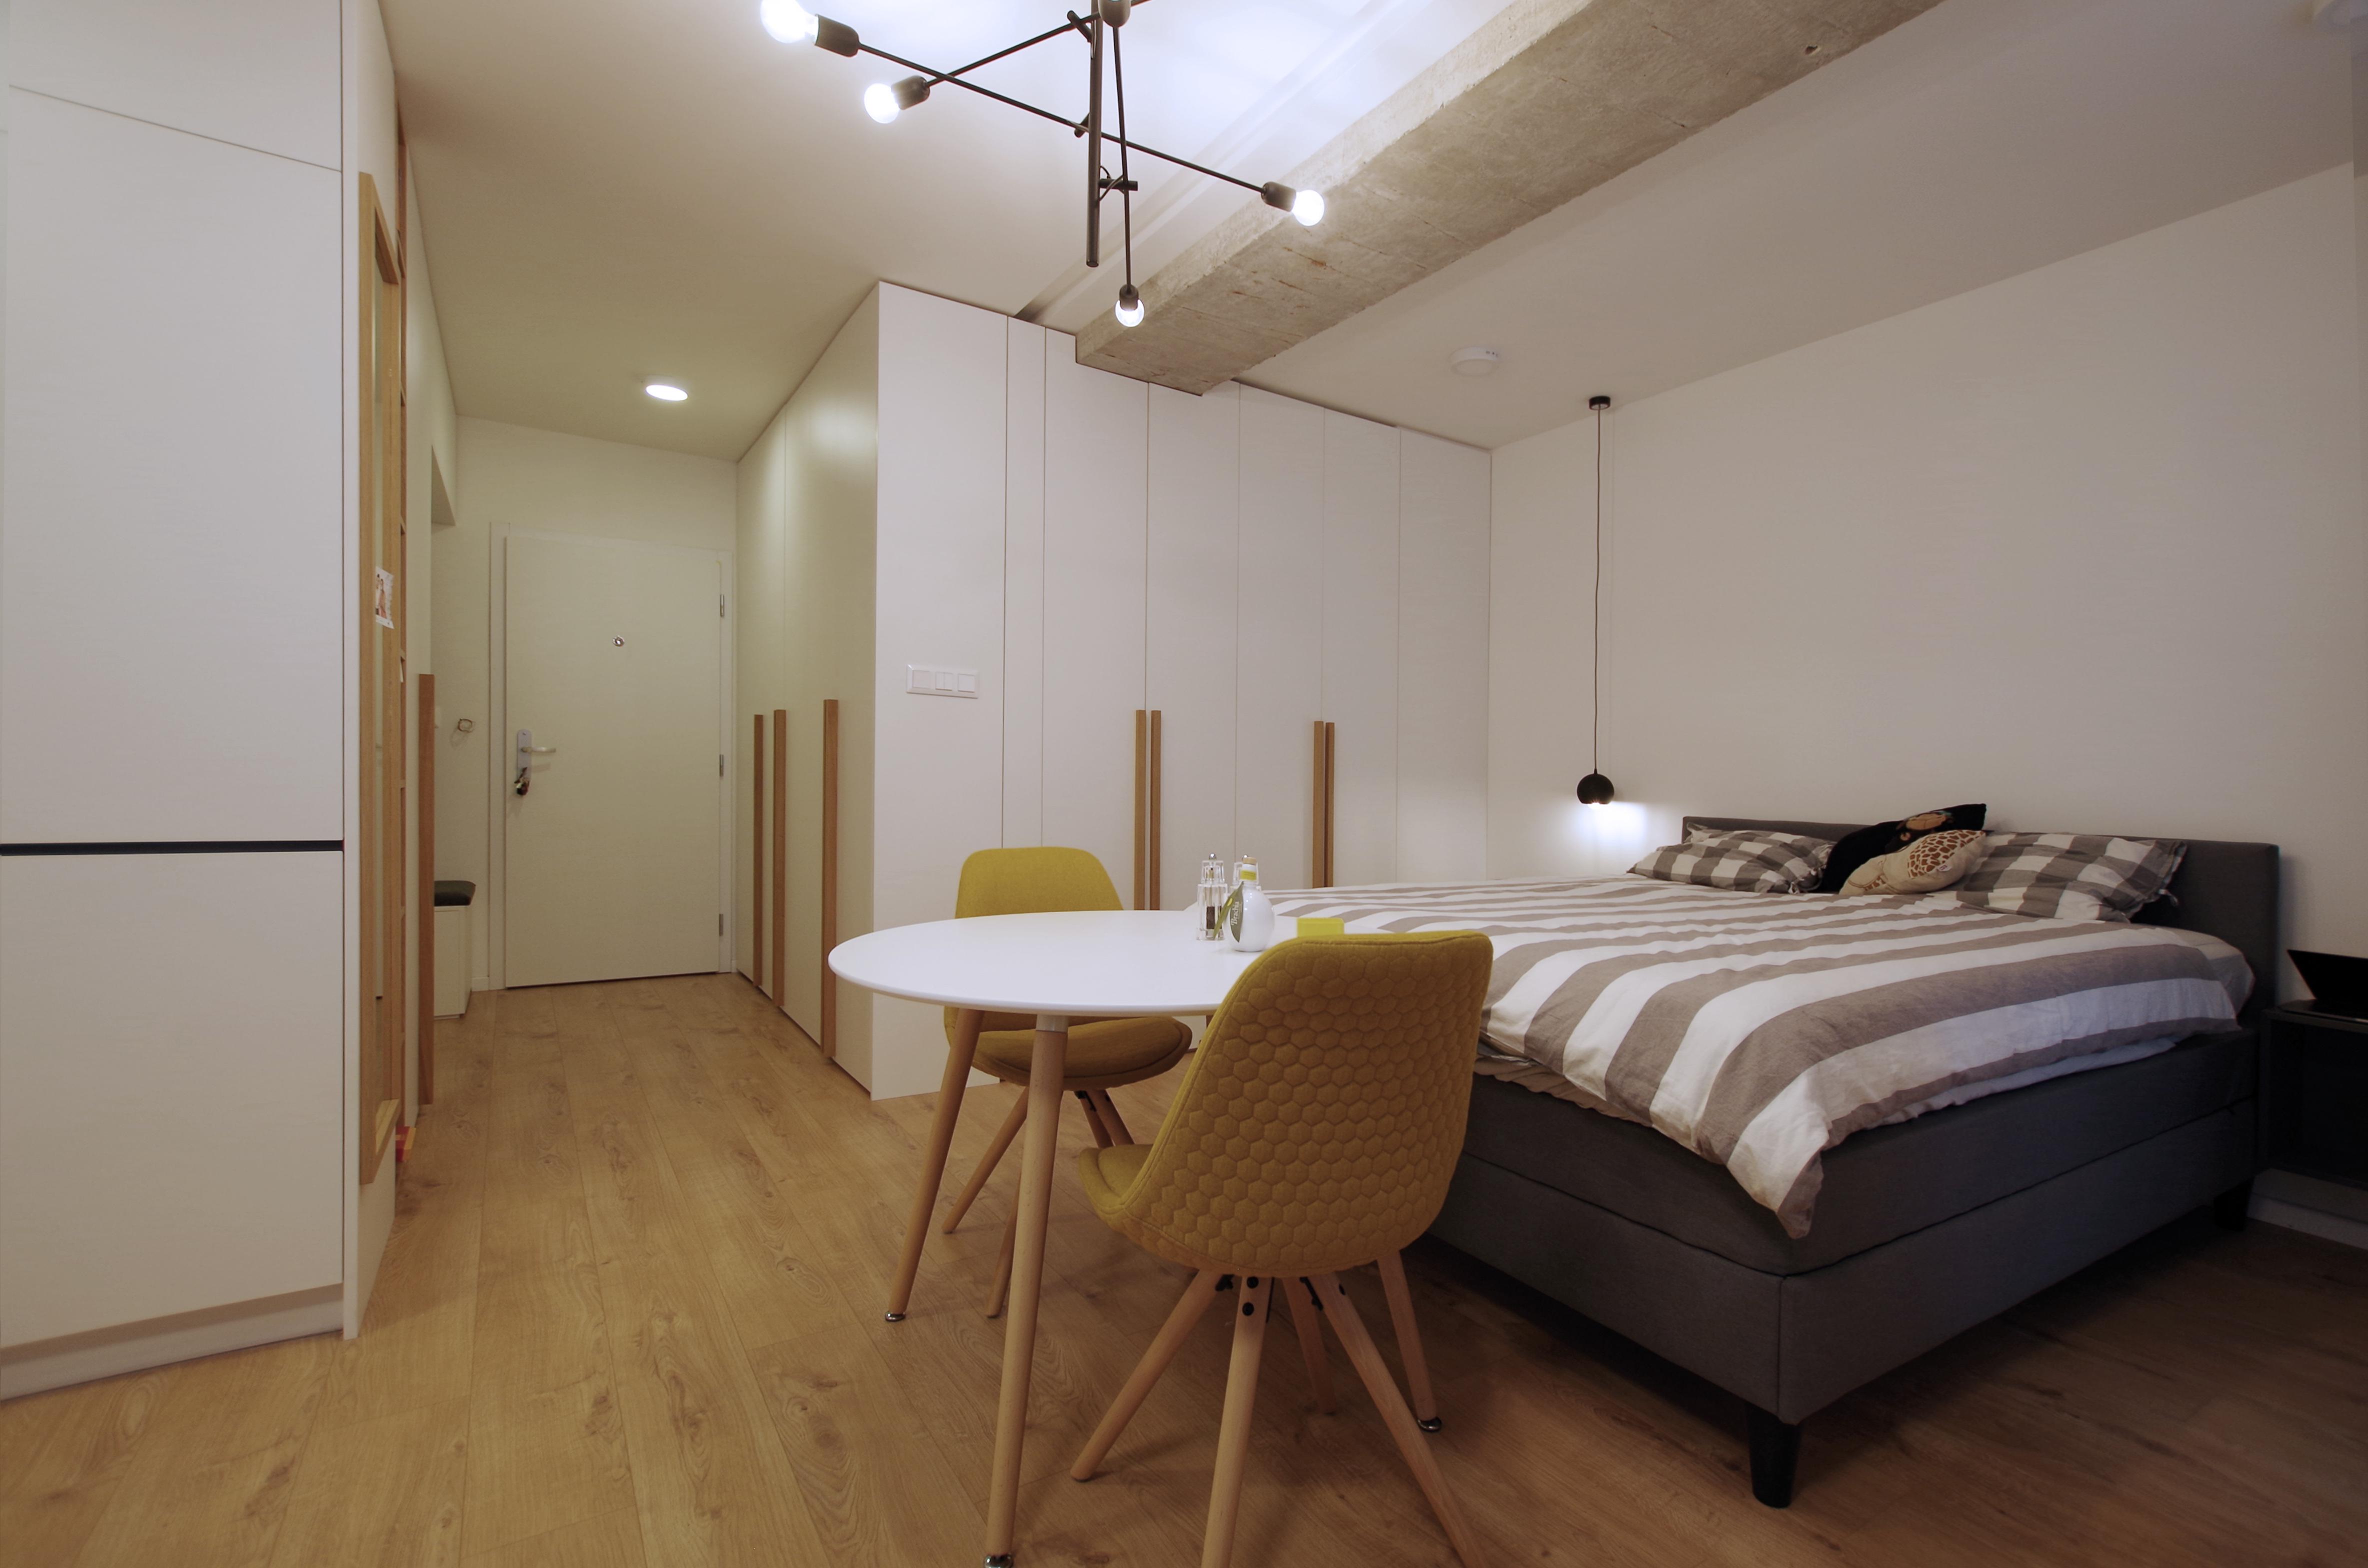 prerabka bytu inspiracie spálňa male byty dizajn